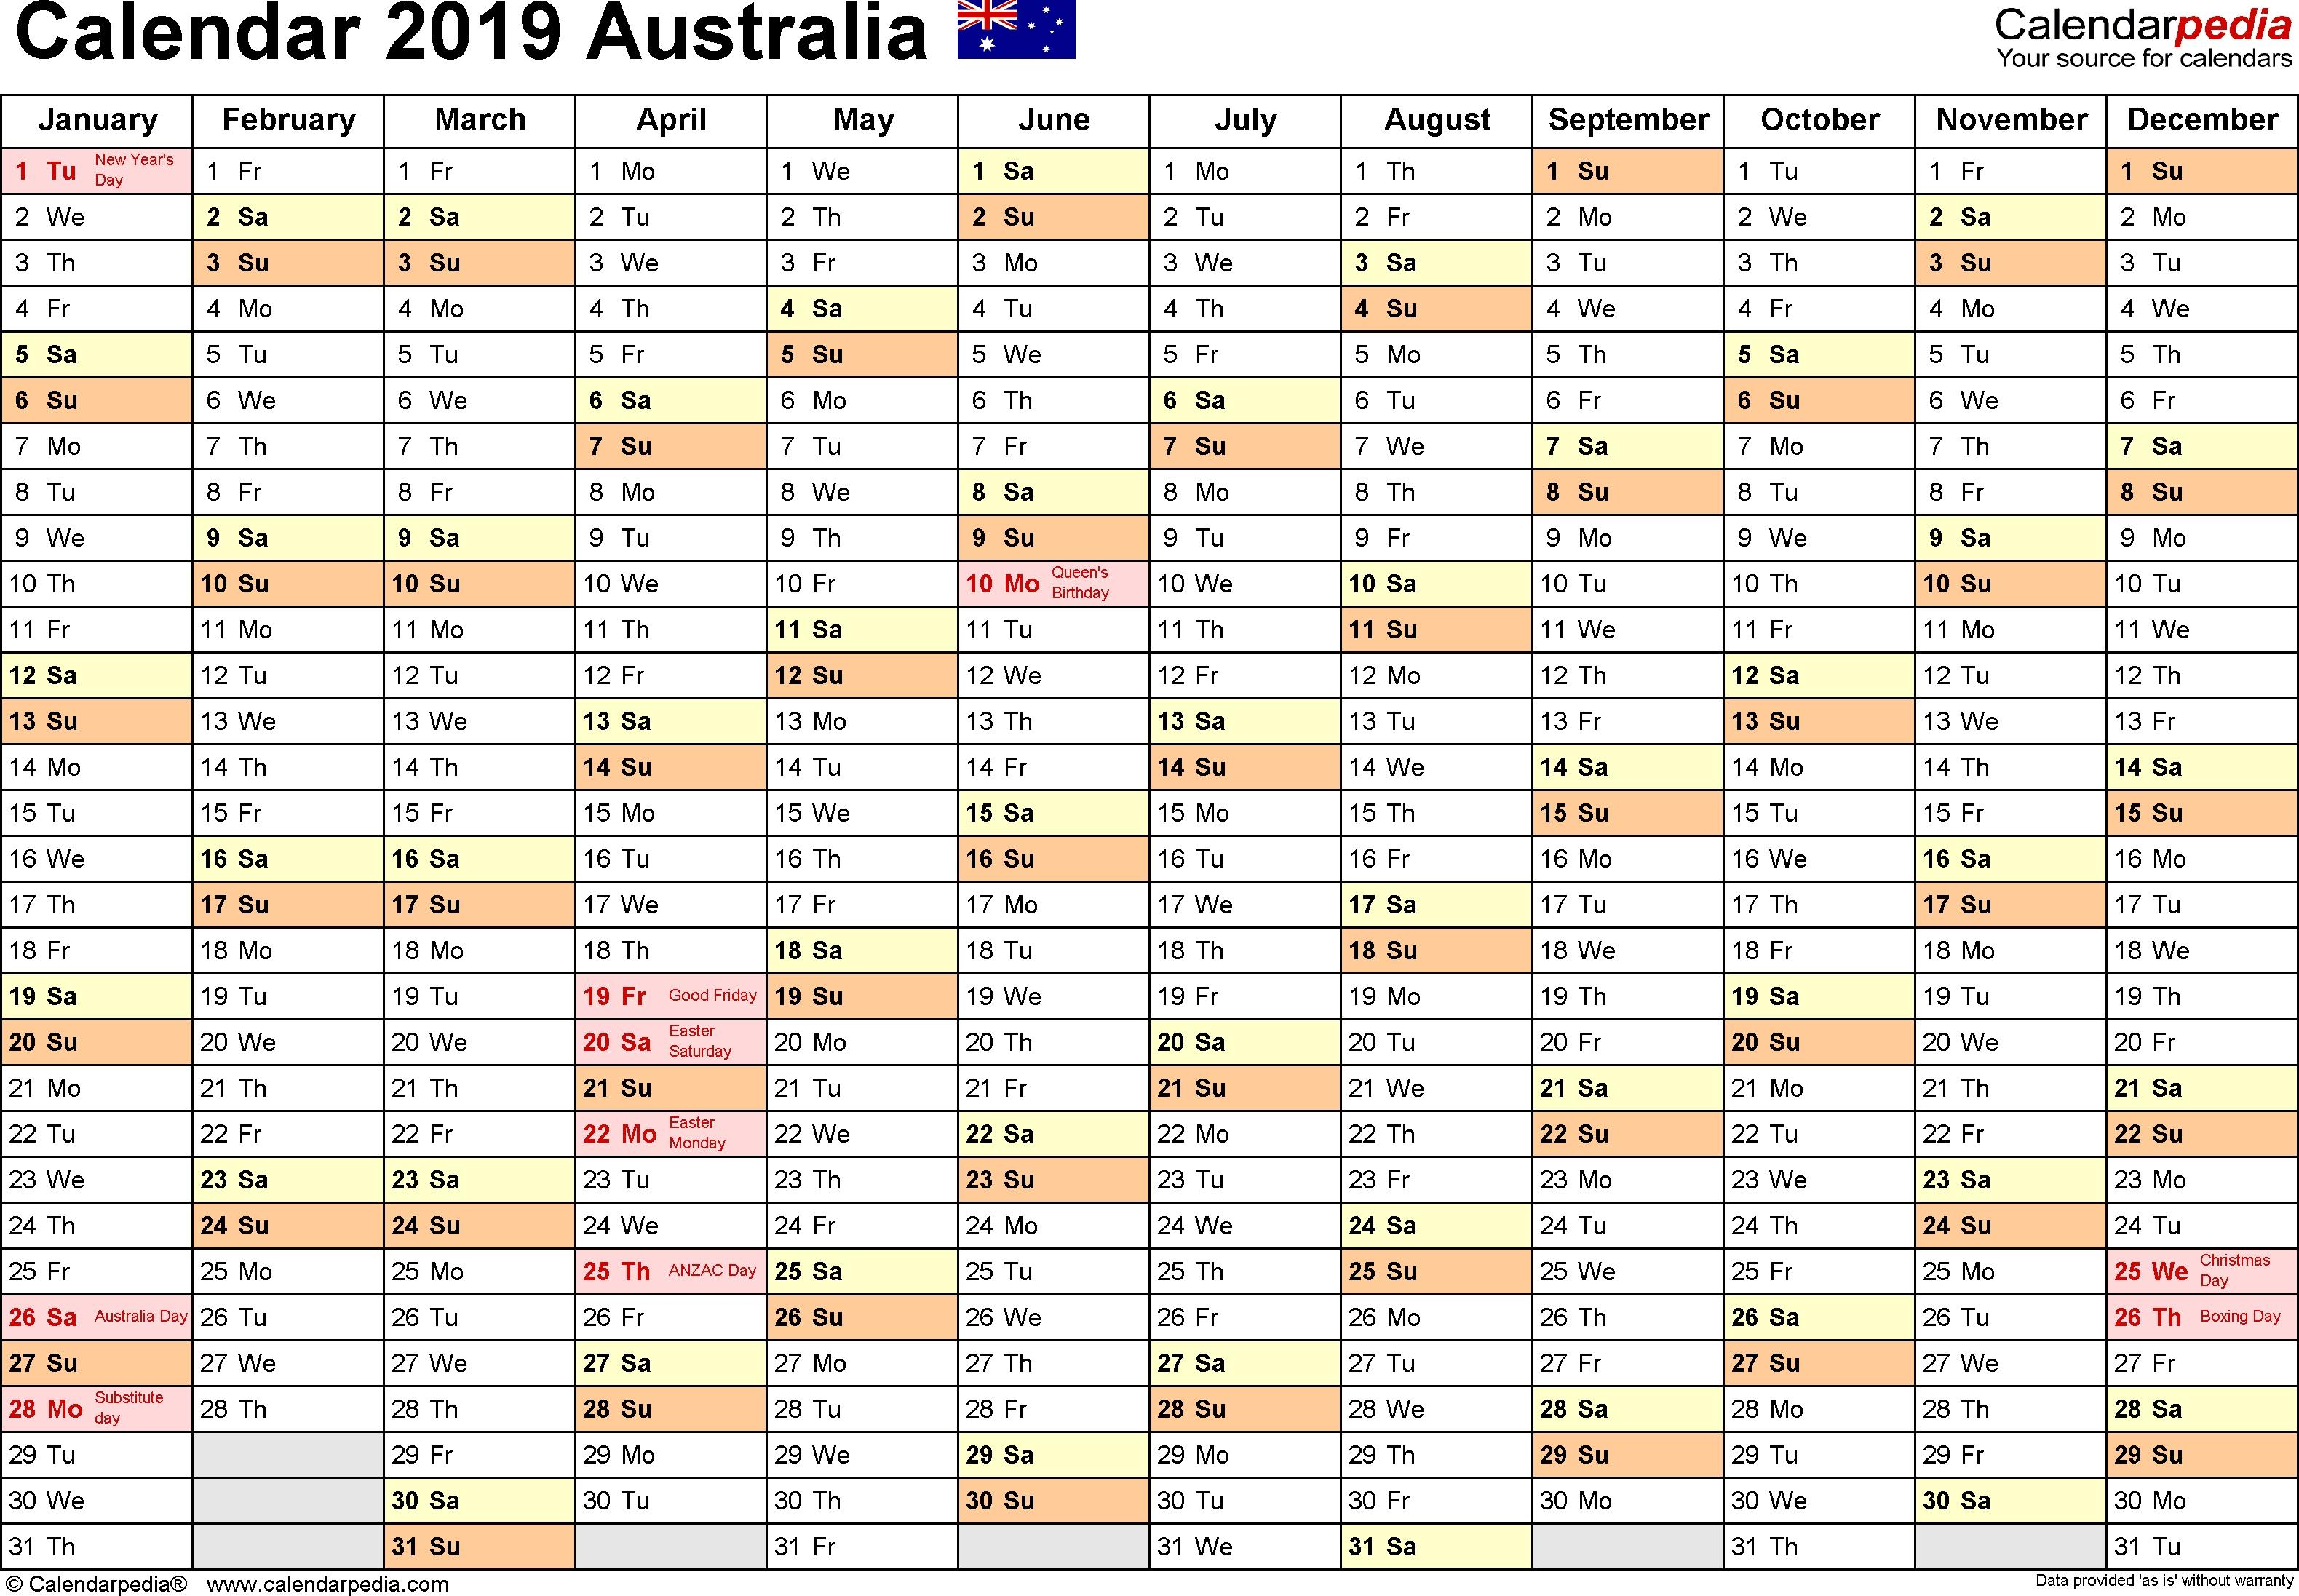 Australia Calendar 2019 - Free Printable Pdf Templates